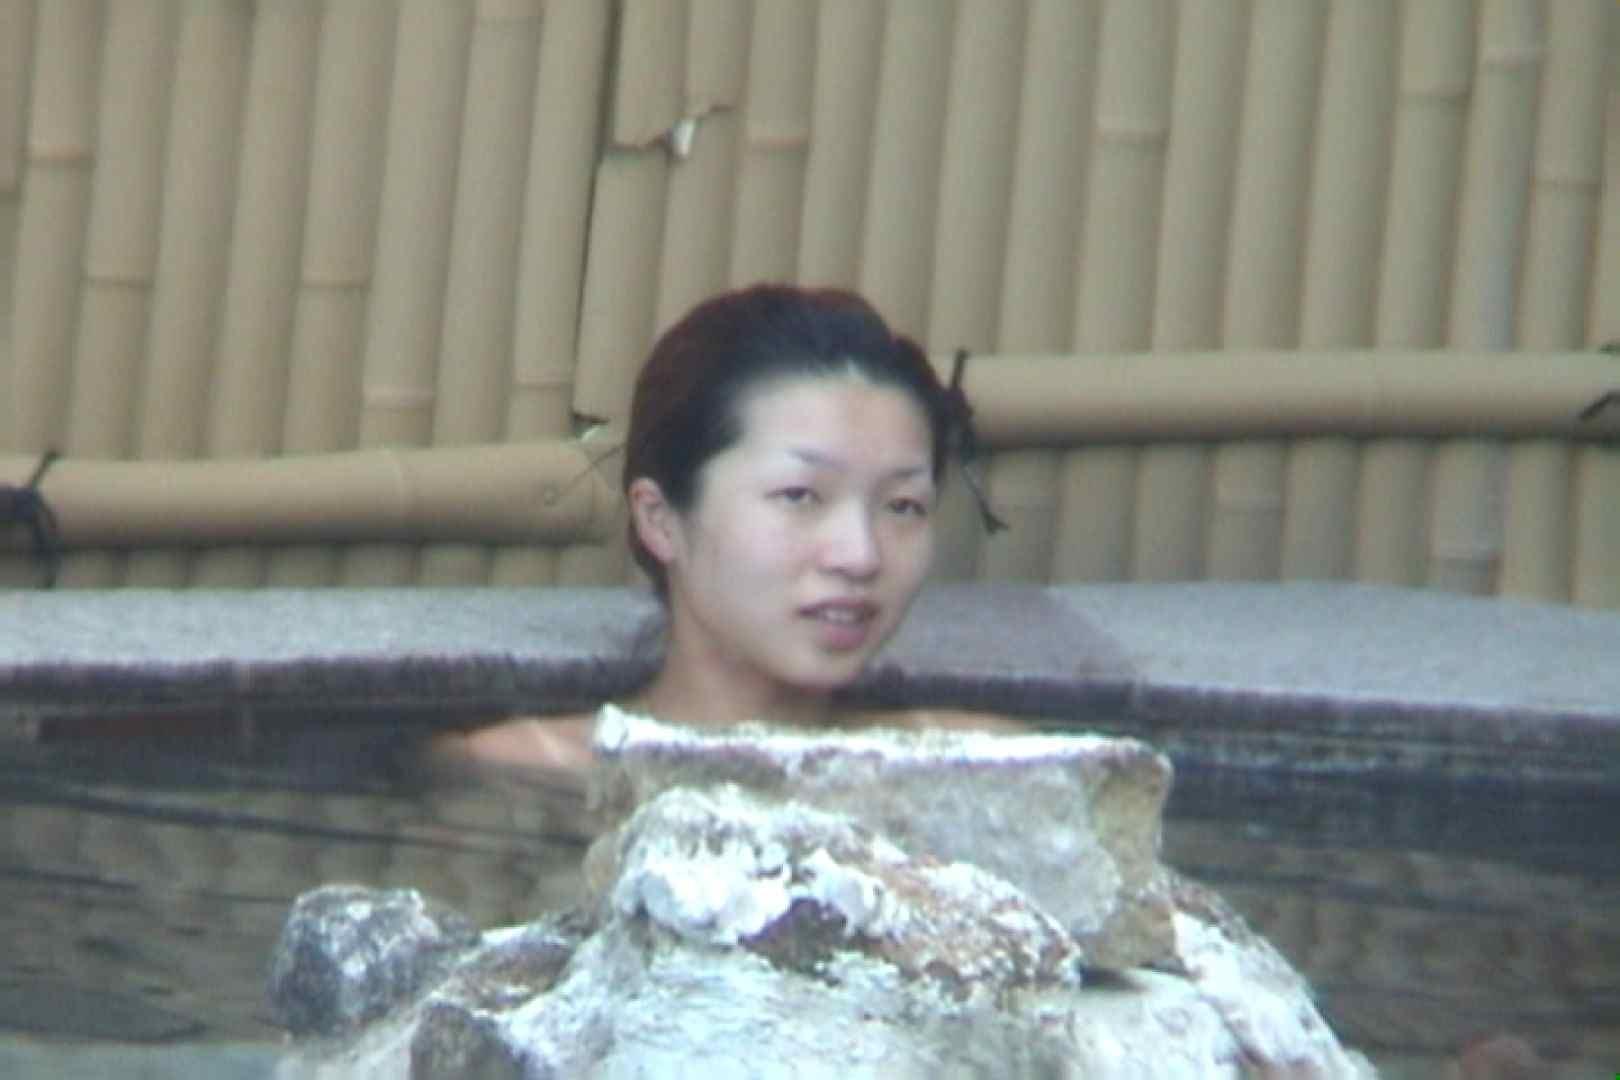 Aquaな露天風呂Vol.571 美しいOLの裸体 | 露天風呂突入  99pic 1